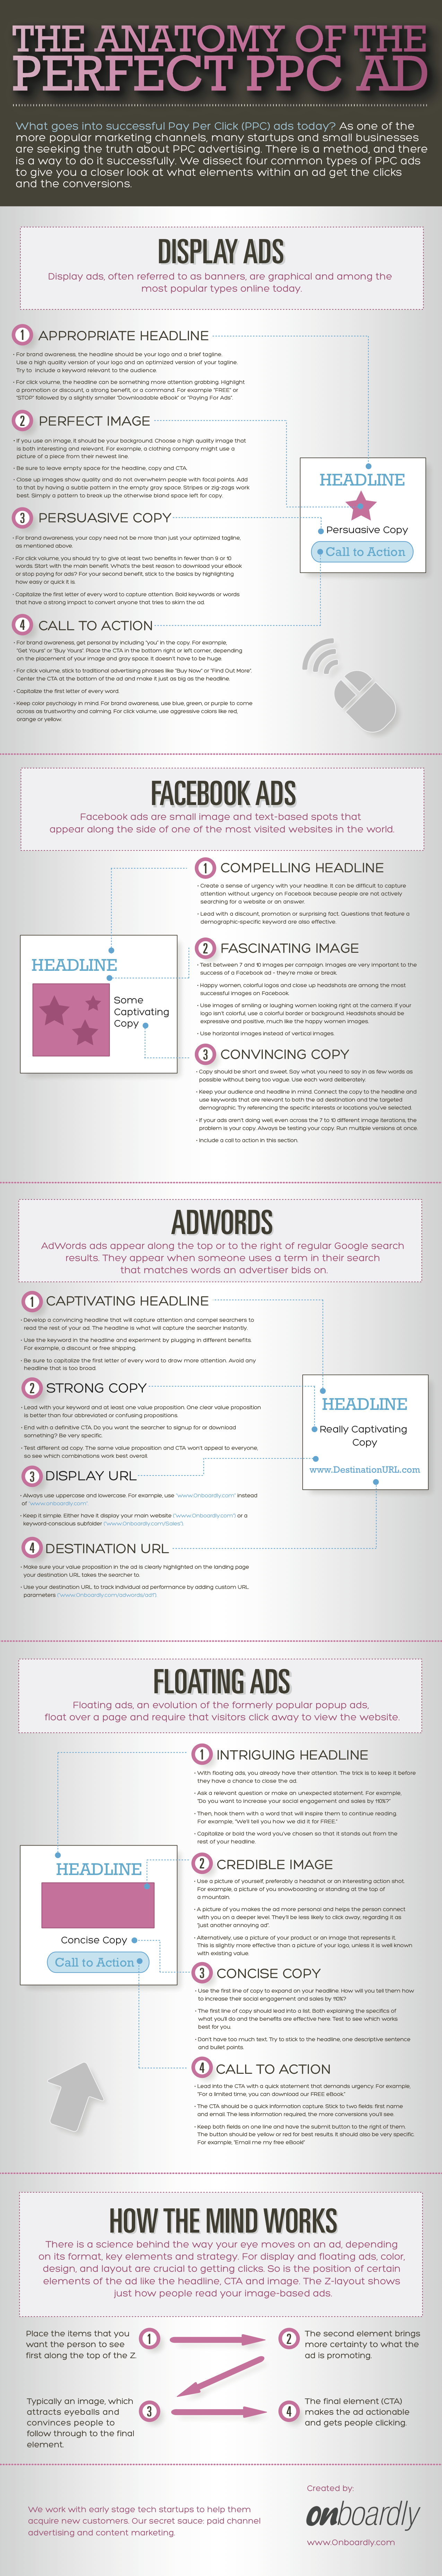 anatomia reklamy infografika